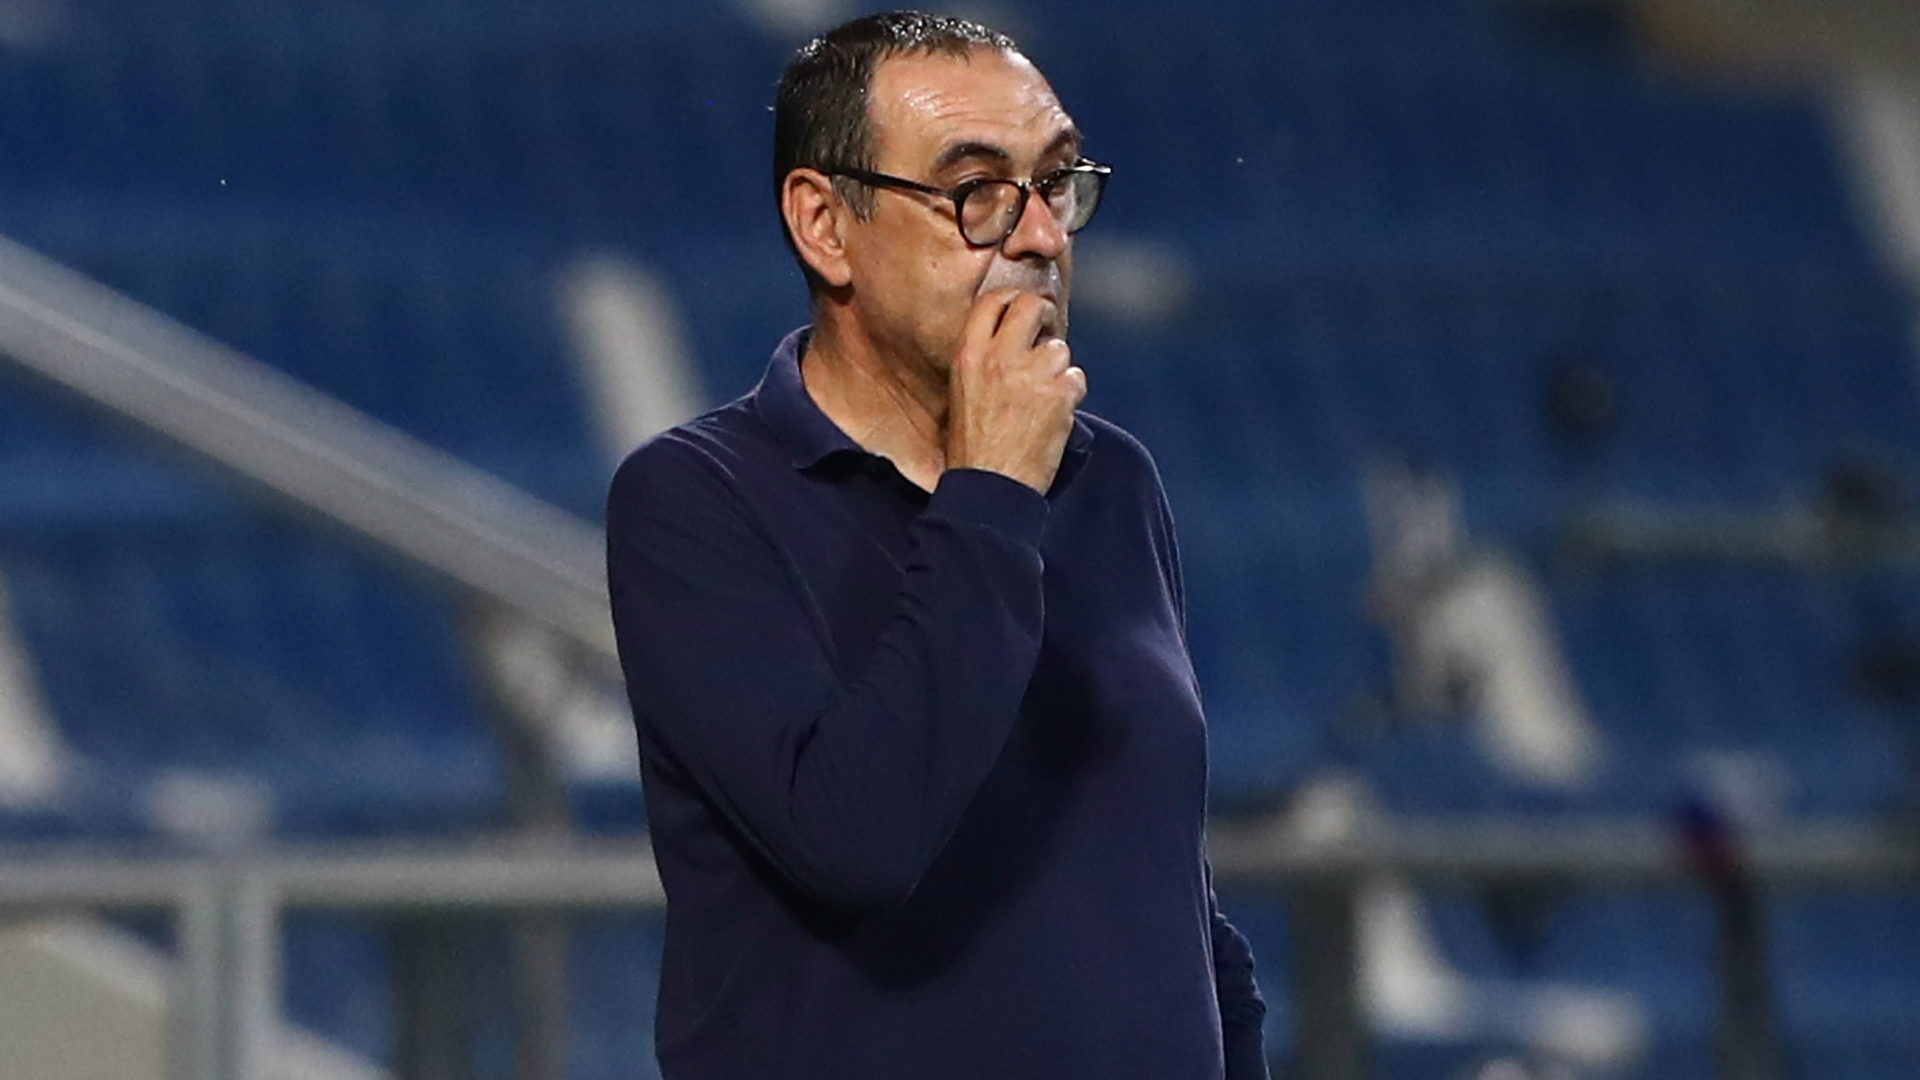 Juventus are 'cursed' in the Champions League, says Sarri